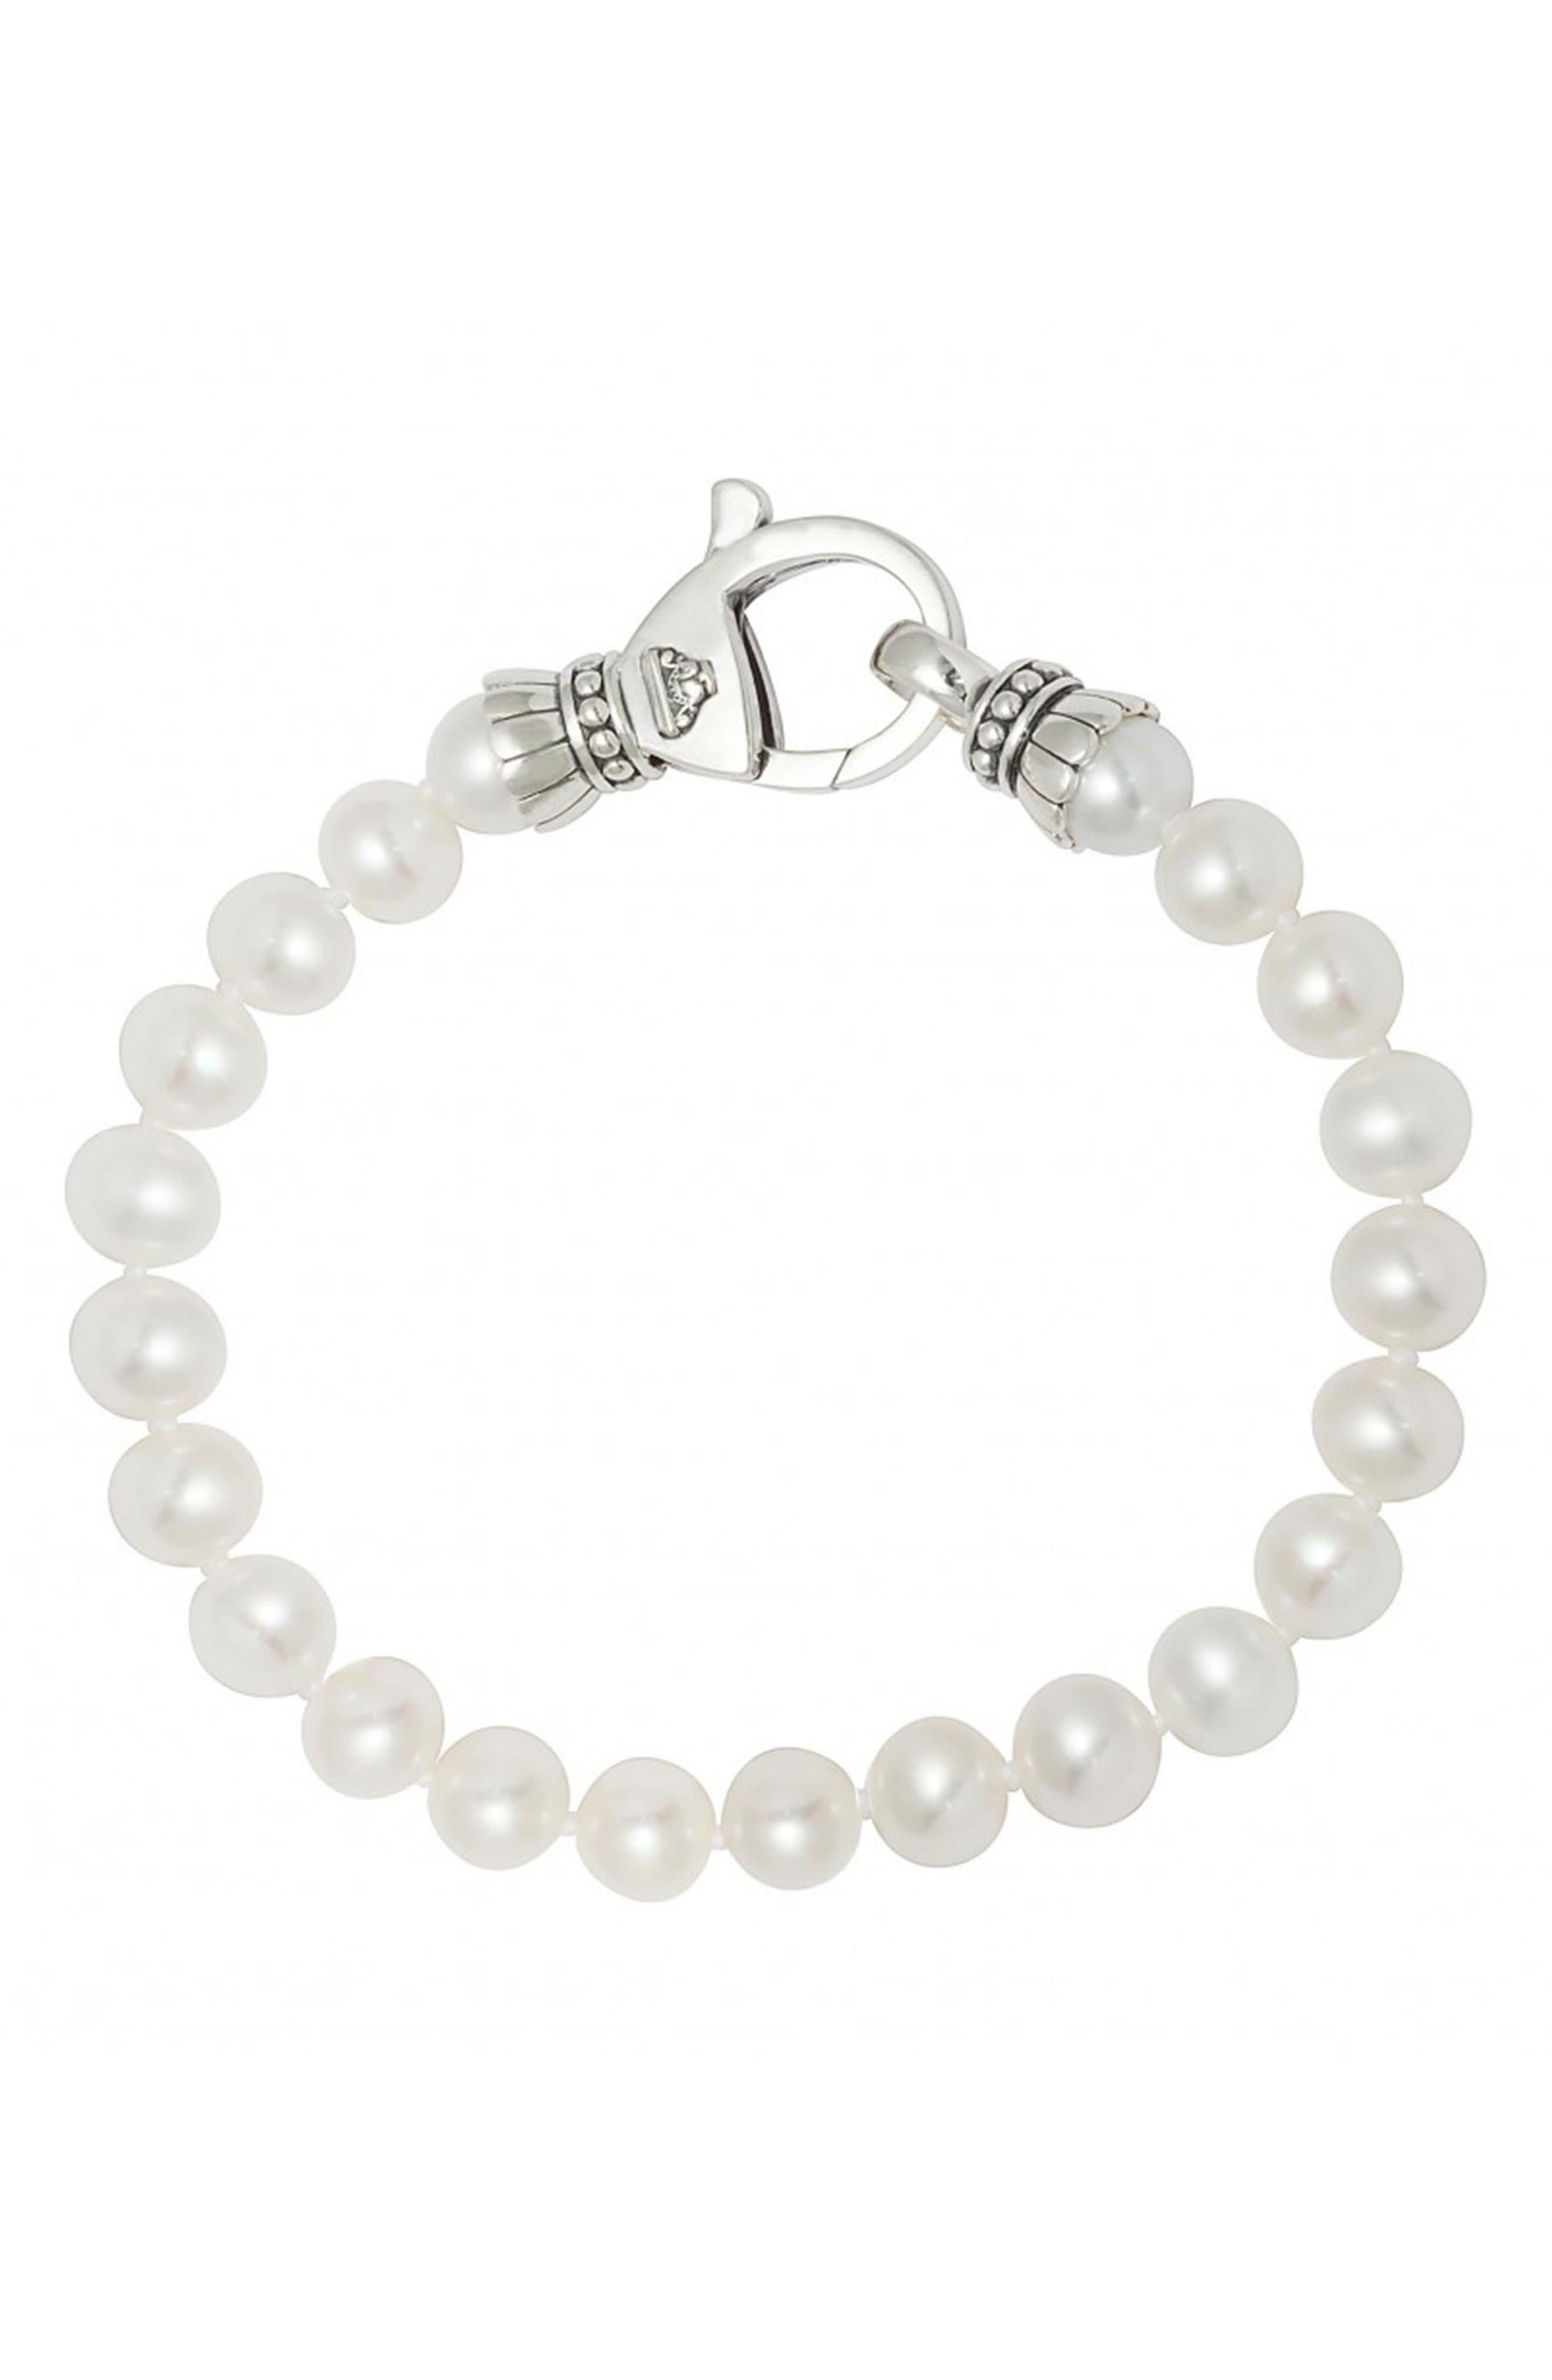 'Luna' 7.5mm Pearl Bracelet,                             Main thumbnail 1, color,                             Silver/ Pearl